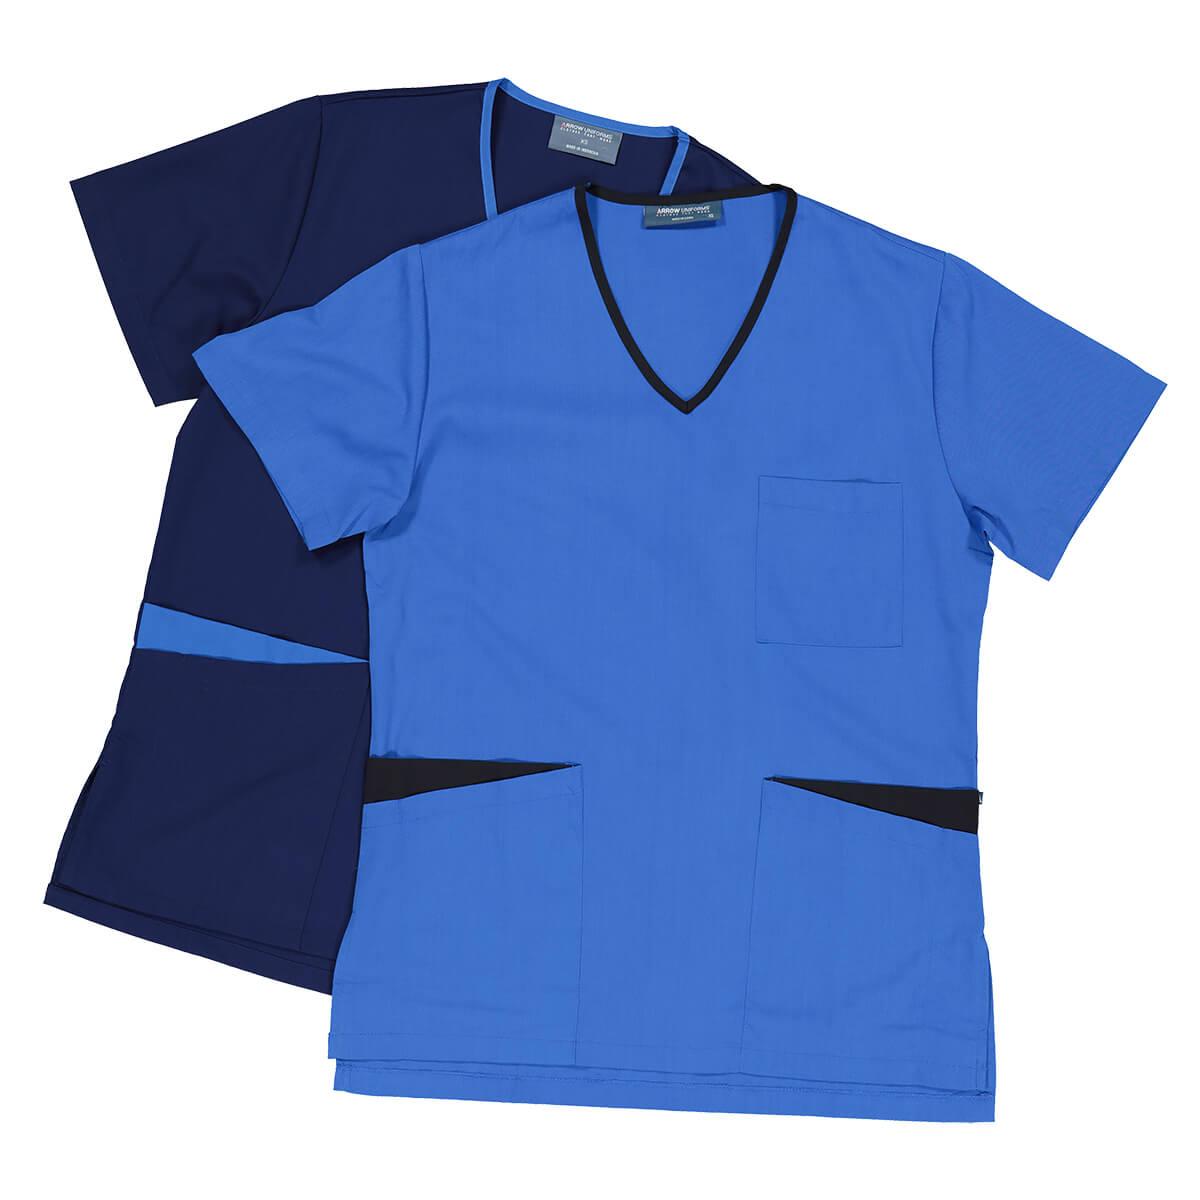 Nurse uniforms in light blue and dark blue photography flat lay